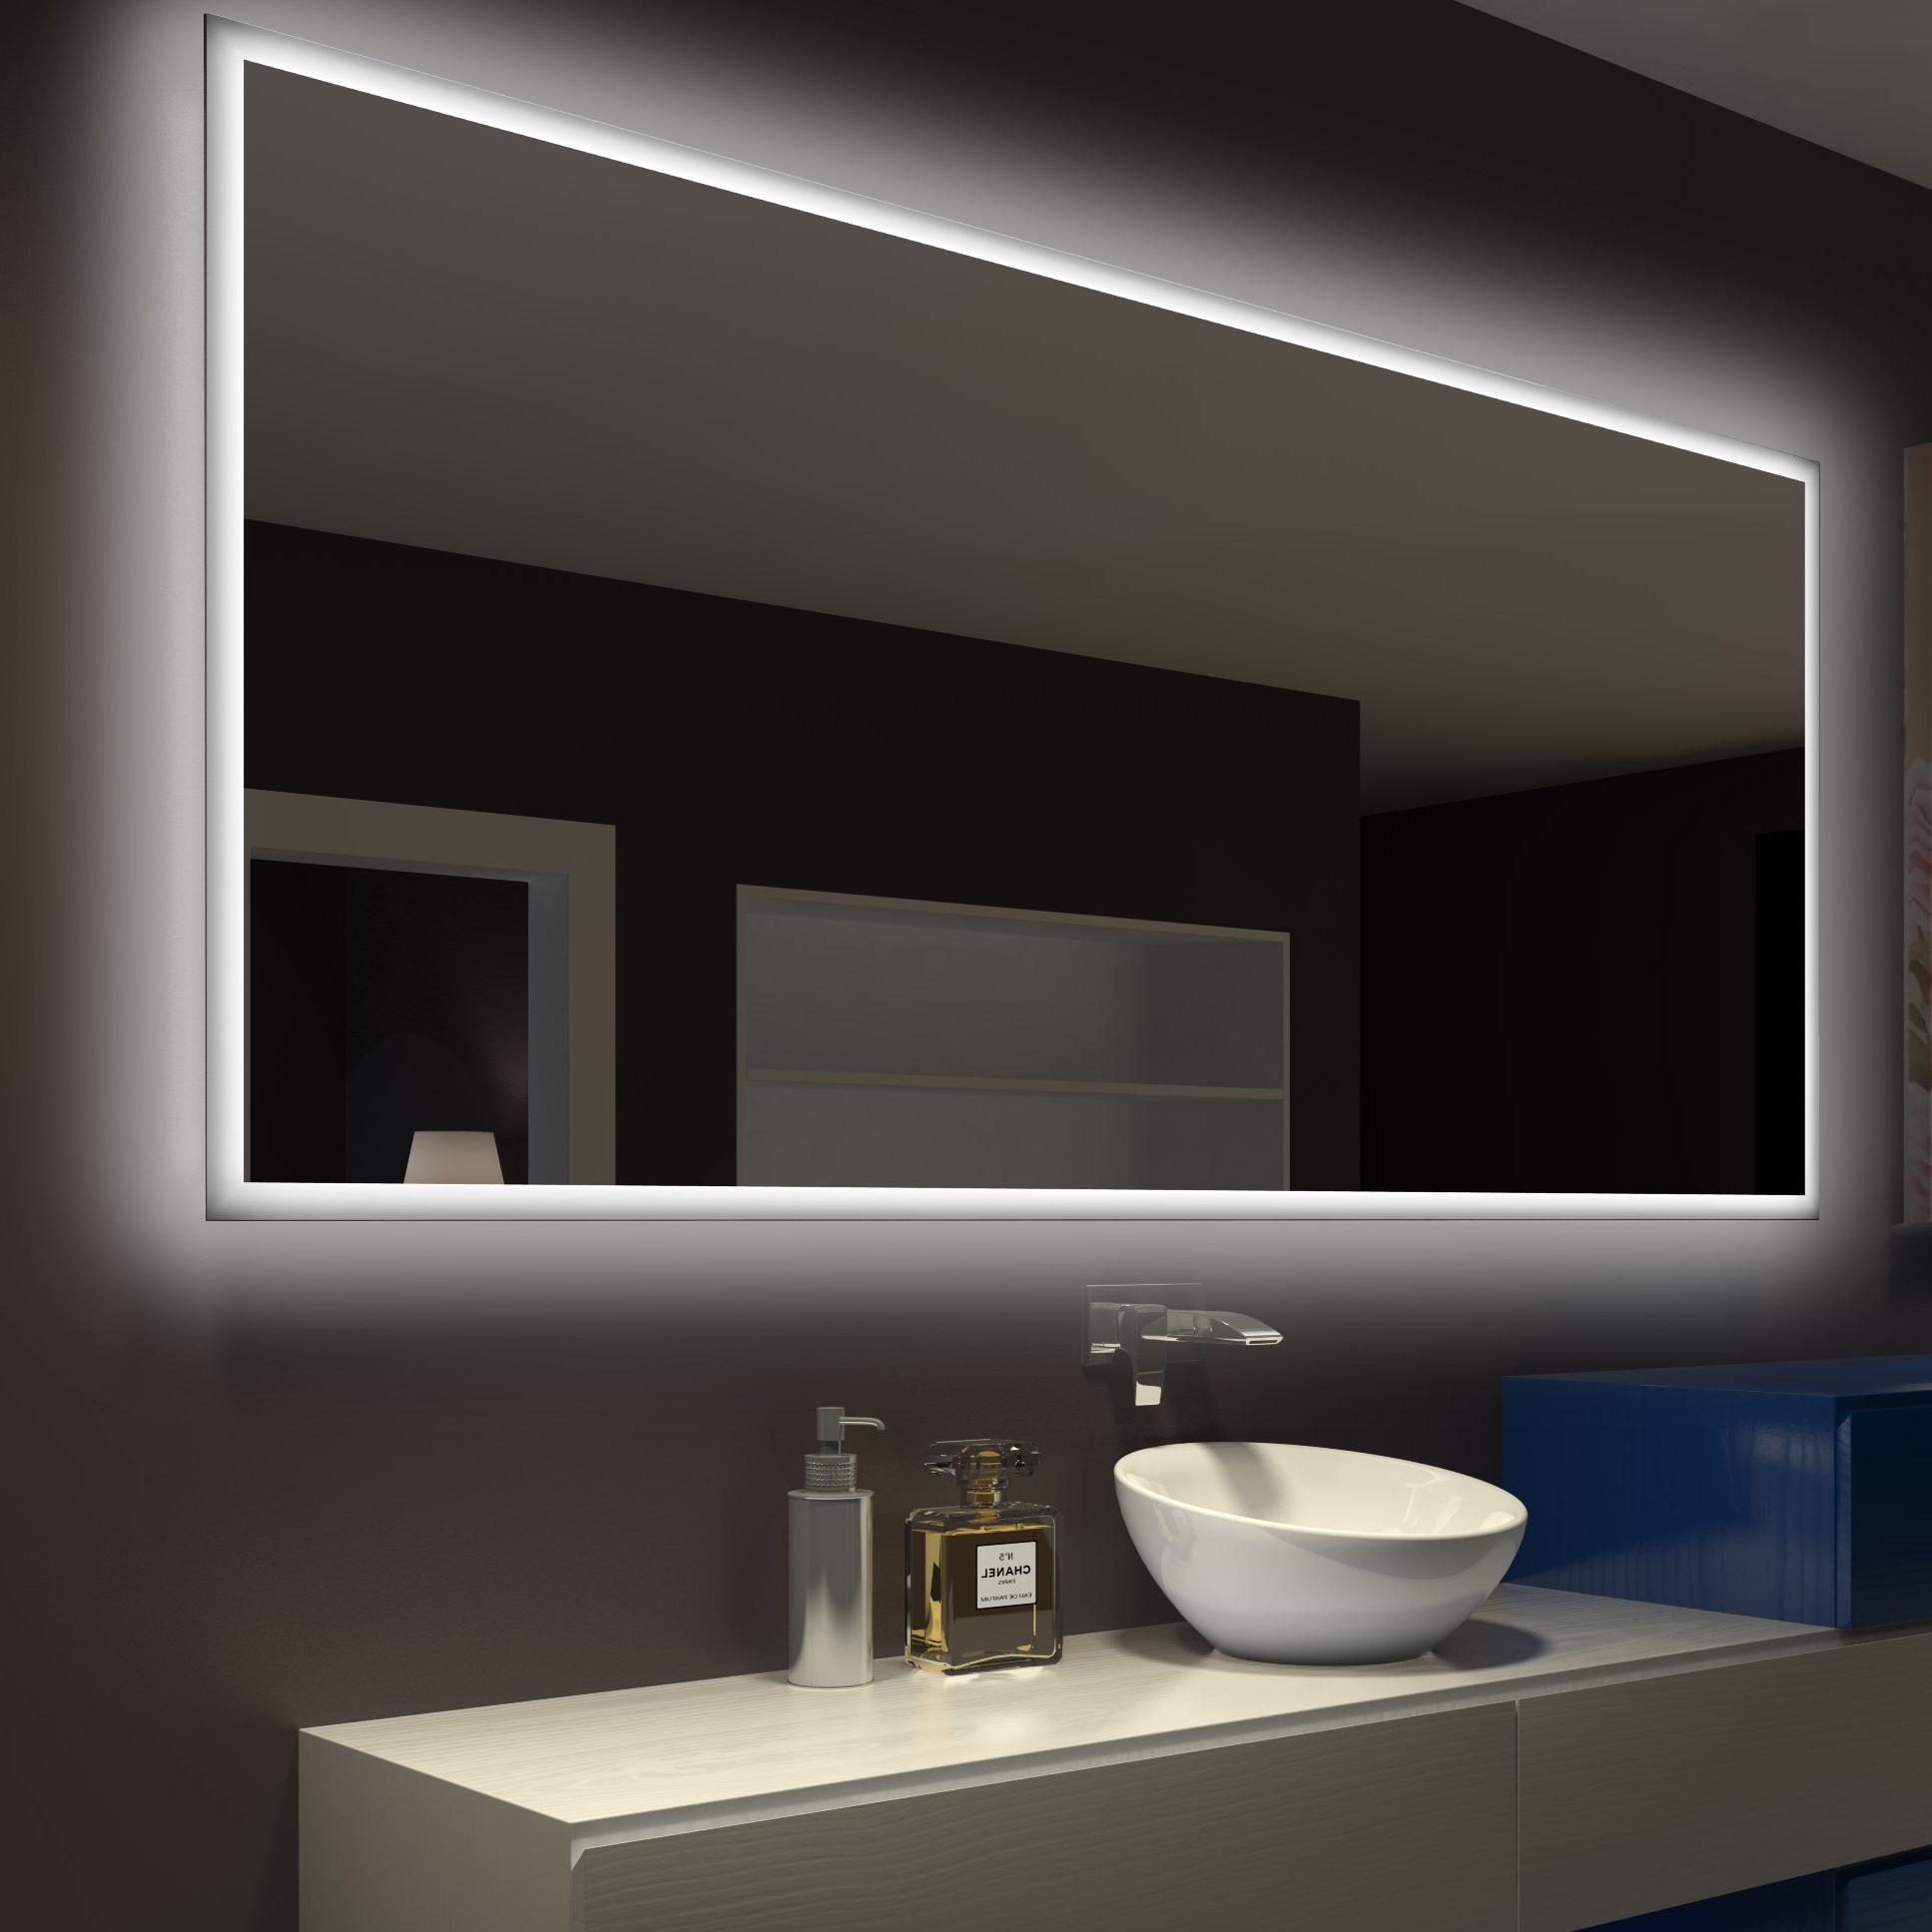 2019 Rectangle Backlit Bathroom/vanity Wall Mirror With Regard To Backlit Bathroom Wall Mirrors (View 2 of 20)